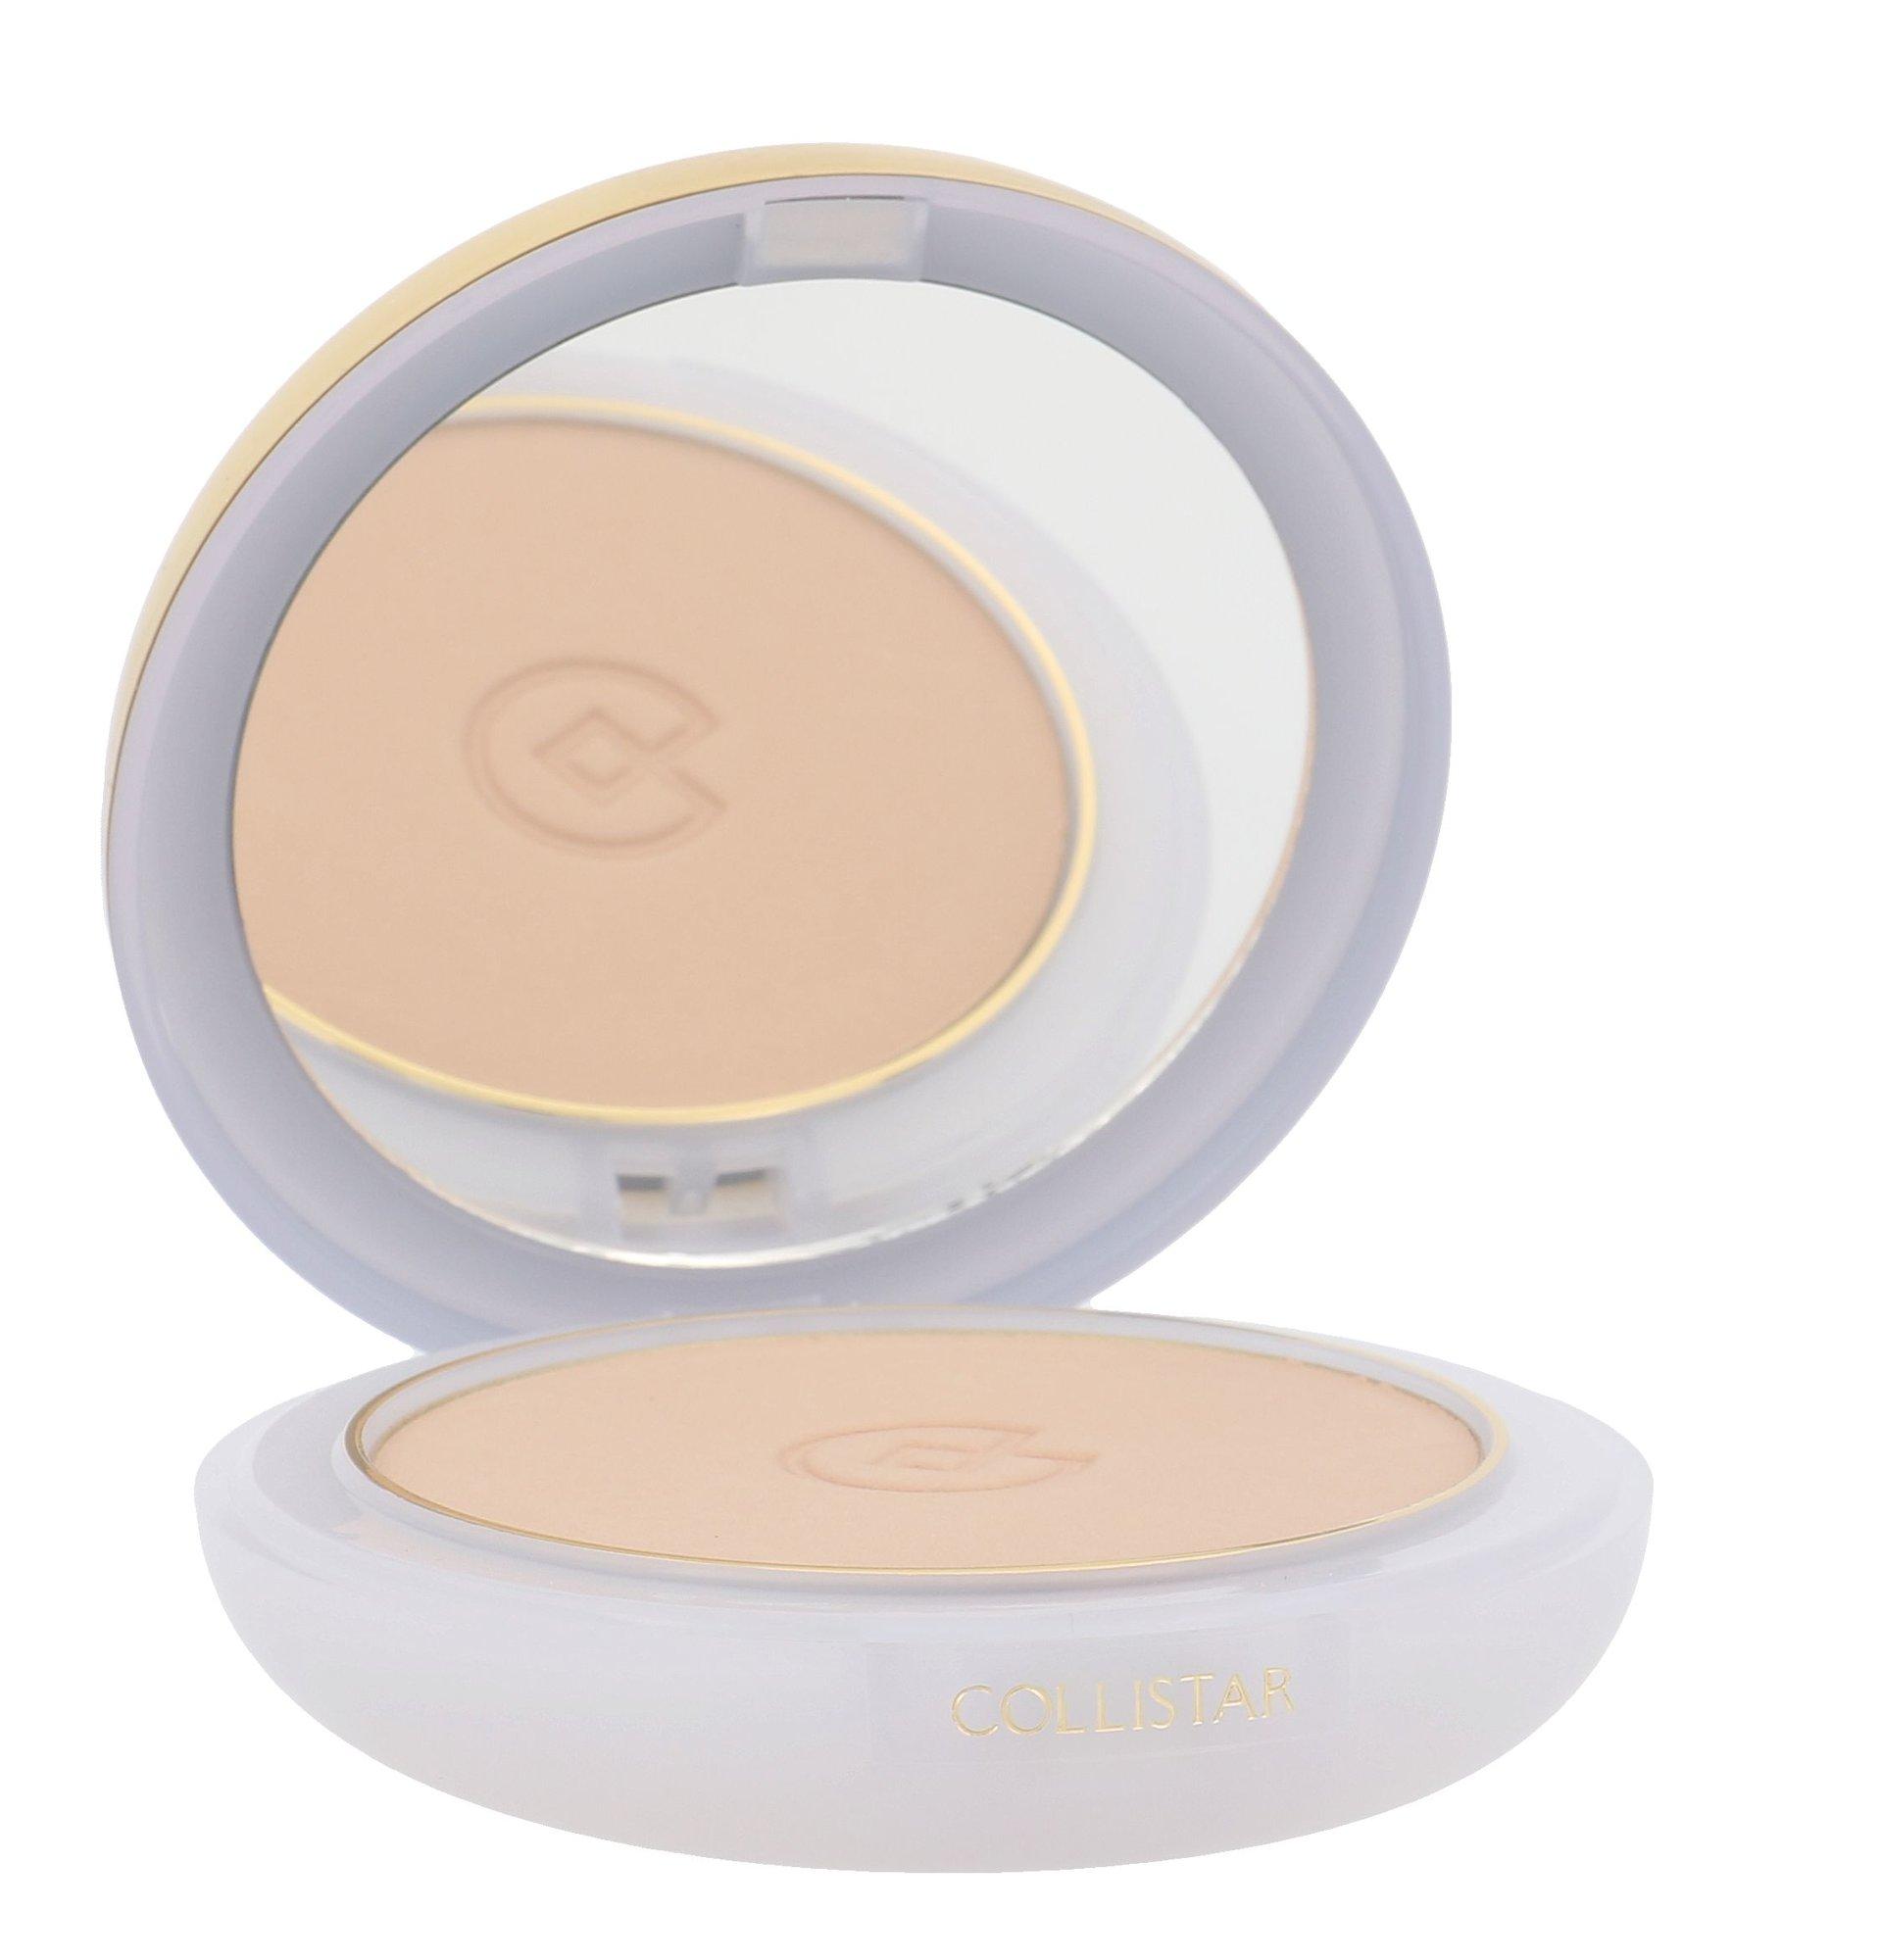 Collistar Compact Matte-Finish Foundation Cosmetic 9ml 2 Beige